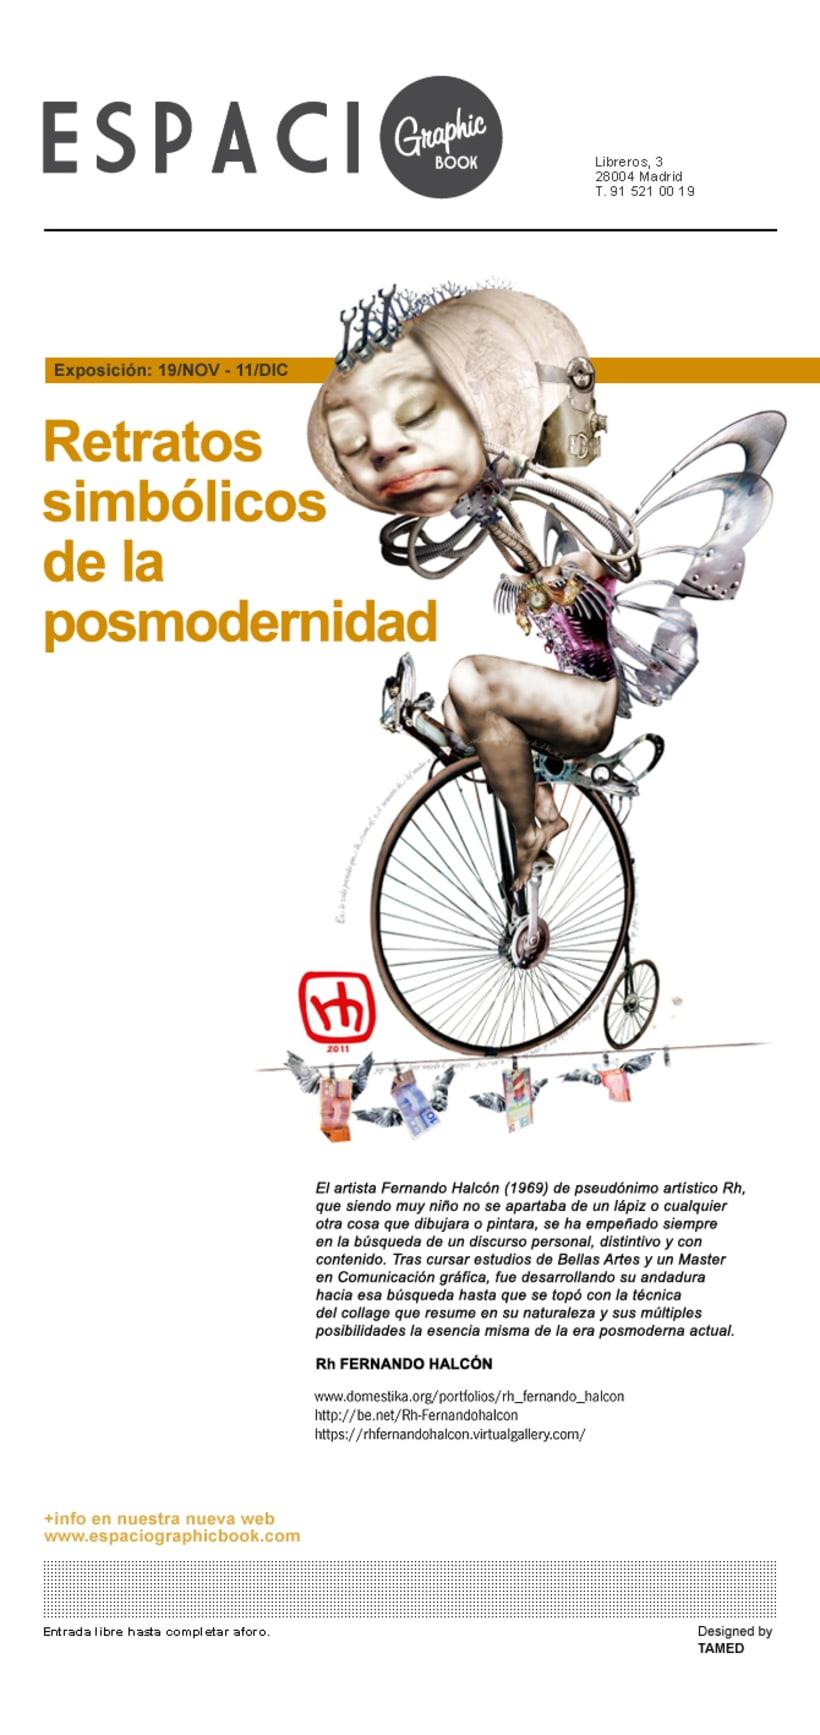 Merchandesign Auto-promocional a partir de obra artística 36